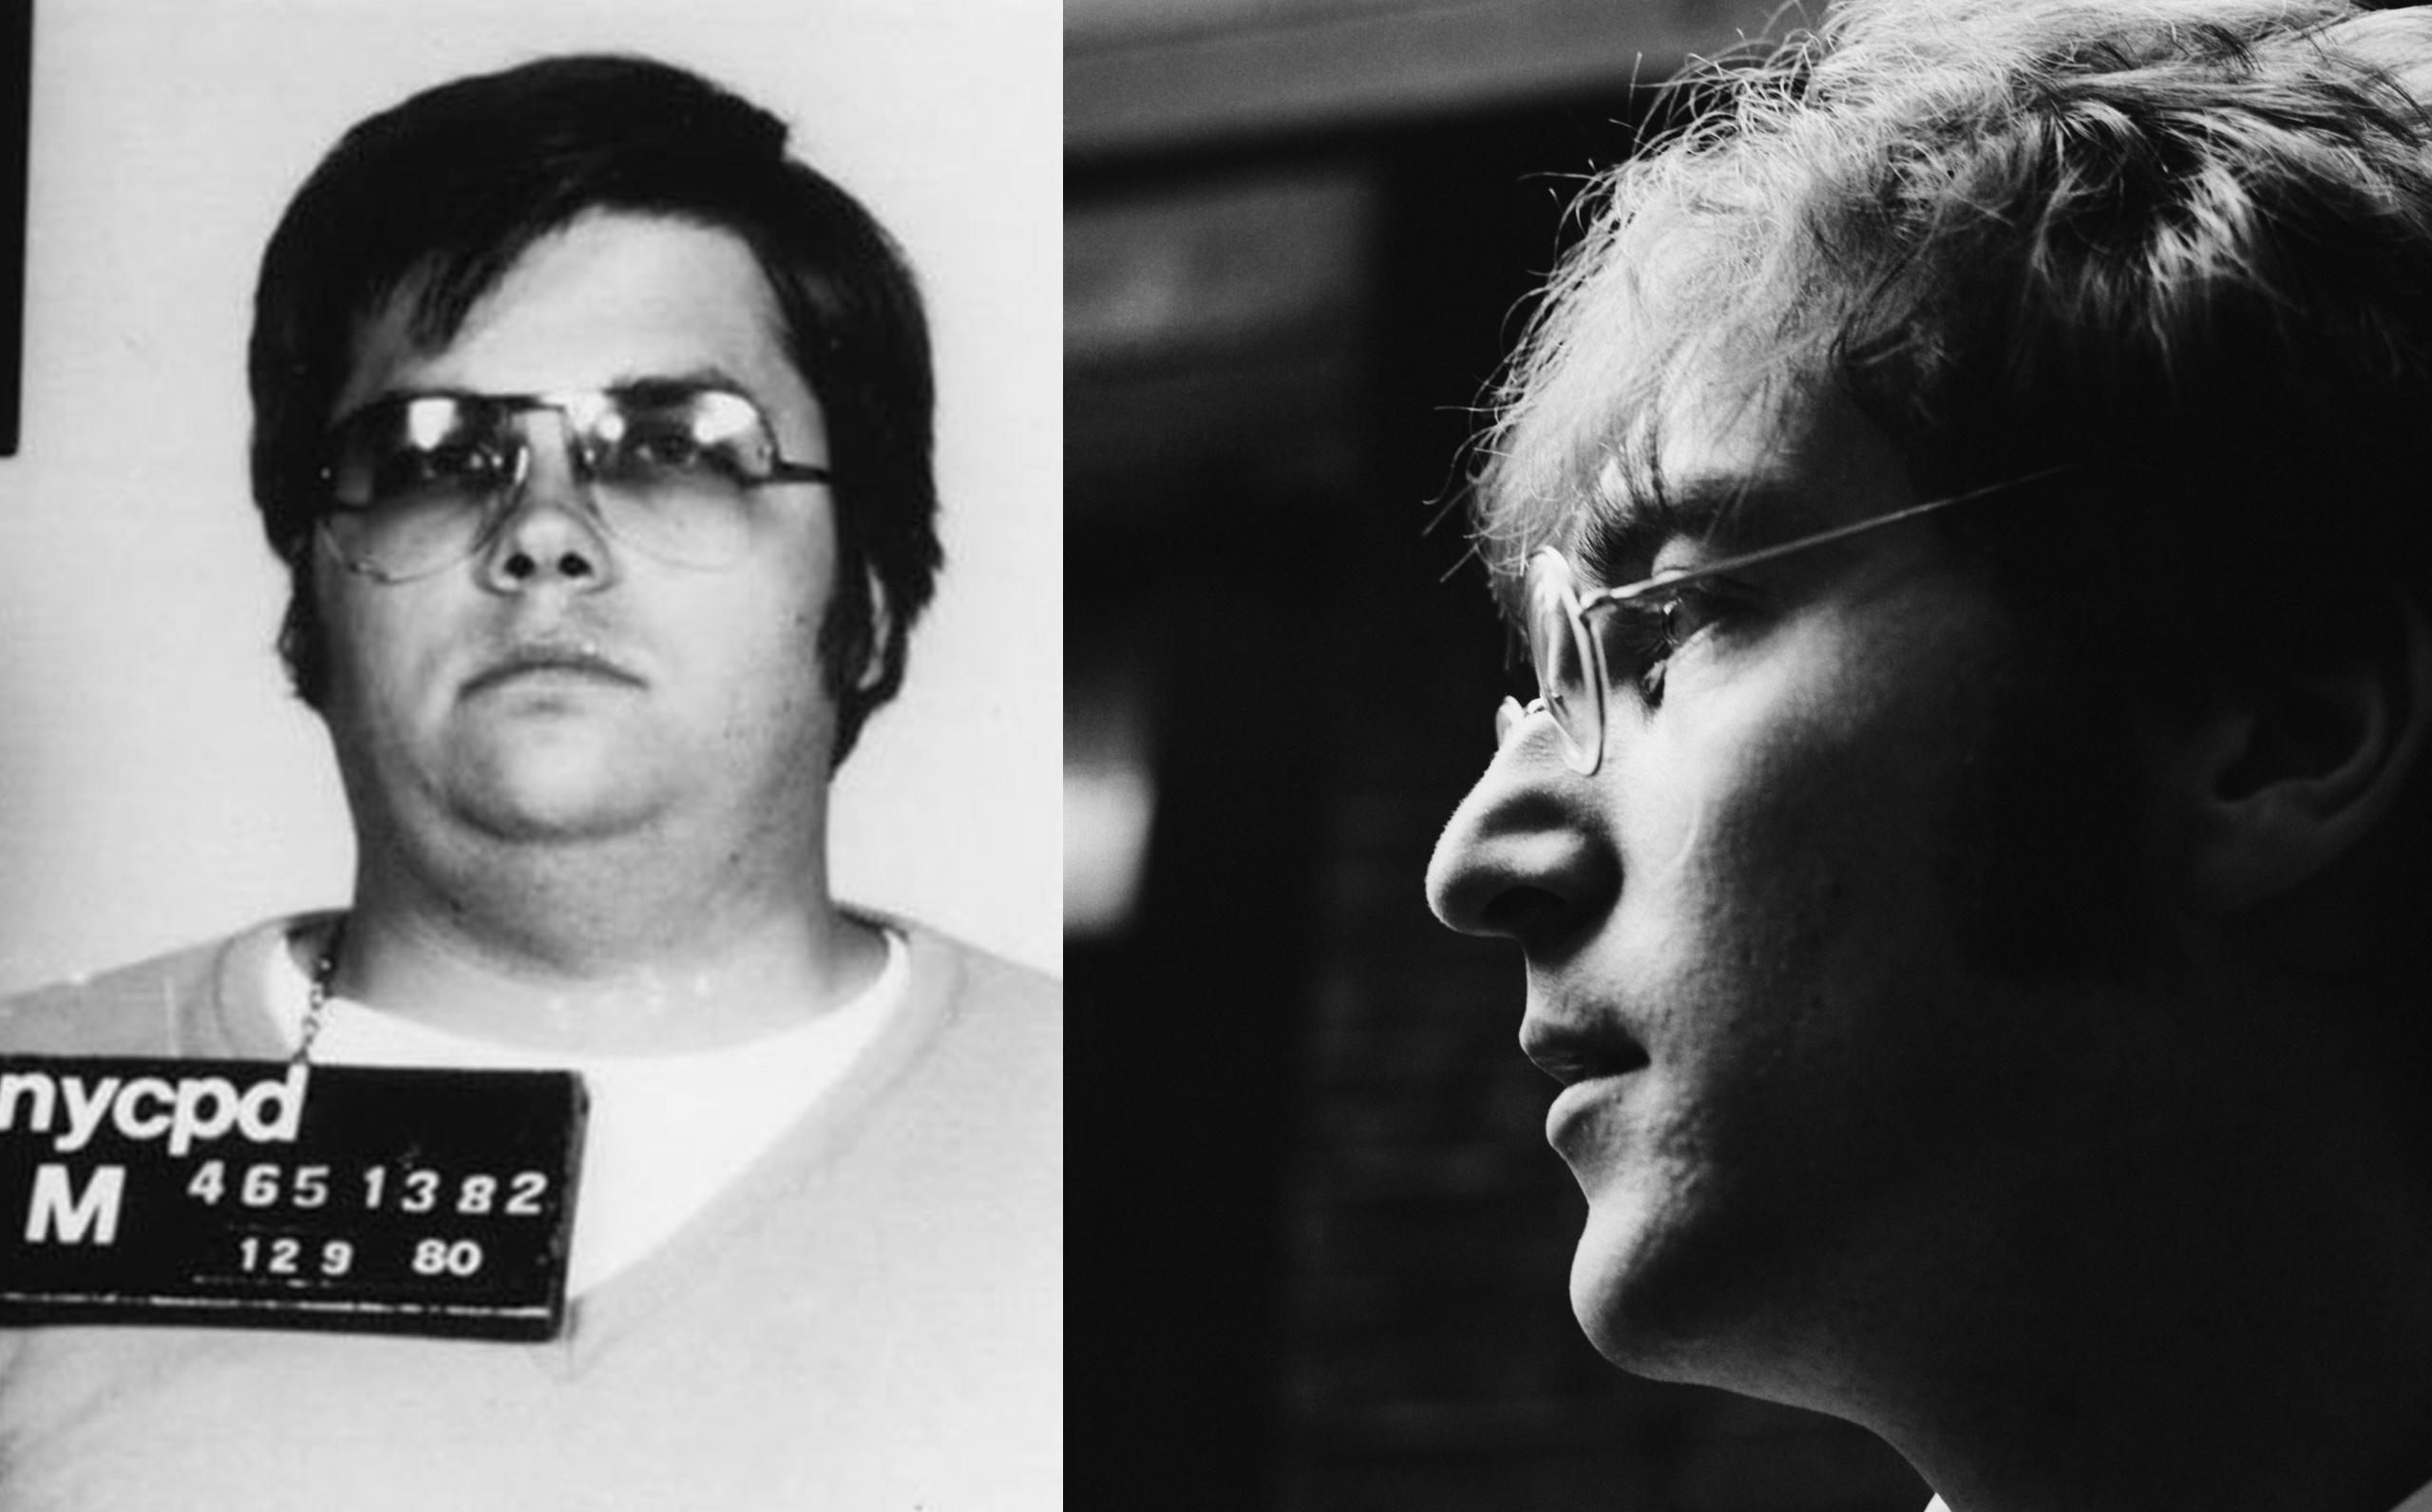 John Lennons Mörder Mark David Chapman entschuldigte sich bei Yoko Ono